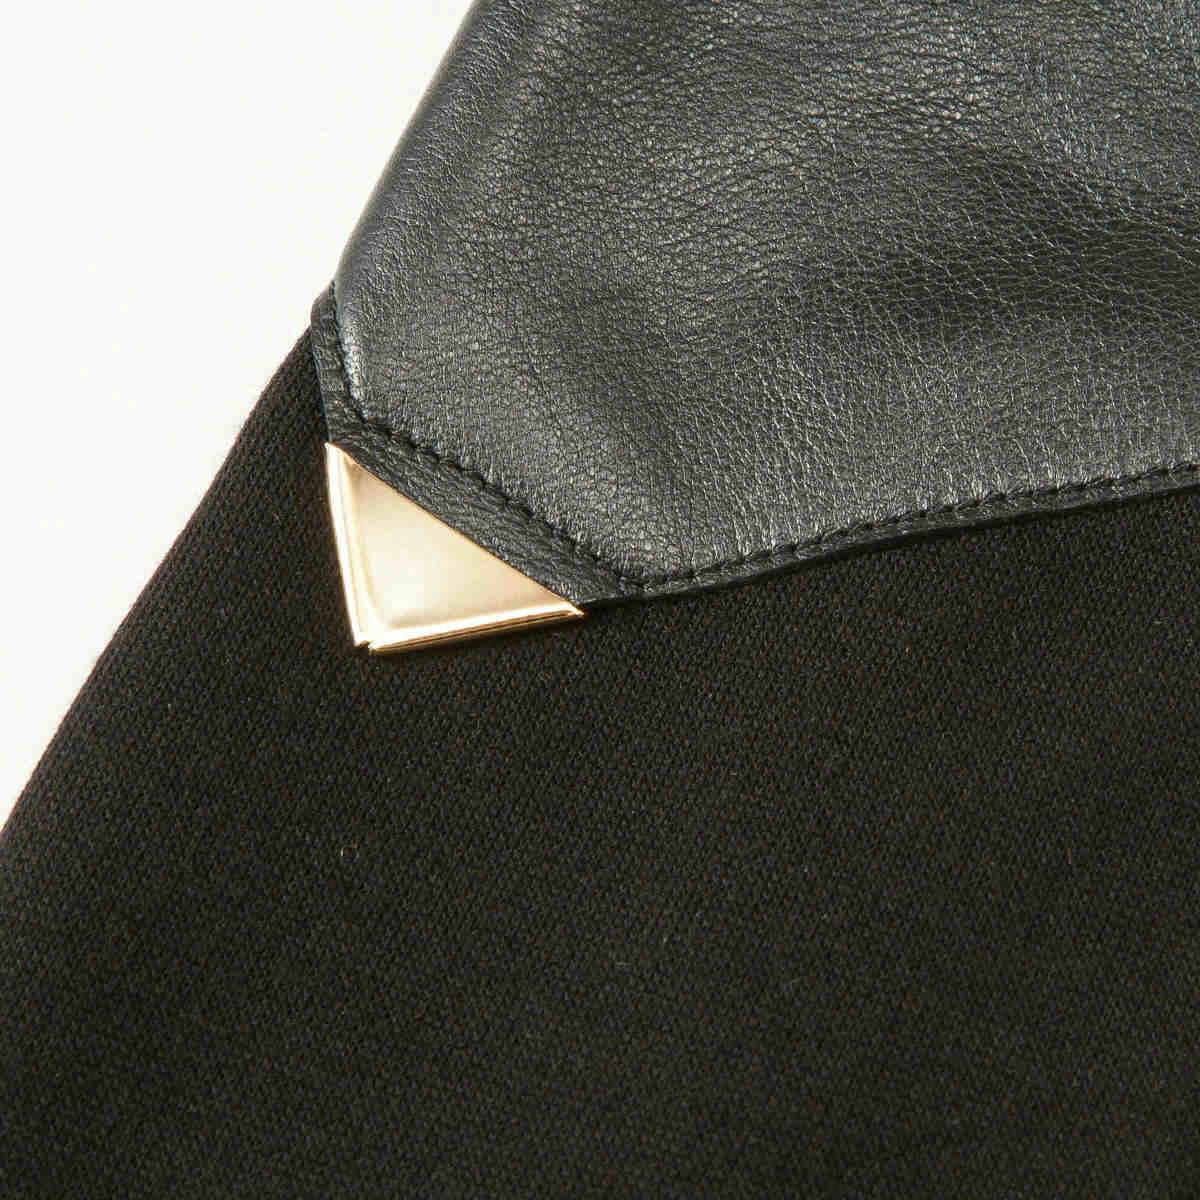 BIYUTE レディース ジャージ手袋 指なしタイプ ちょっと長め丈 甲側レザー ストレッチ素材との組み合わせ Mサイズ 全2色